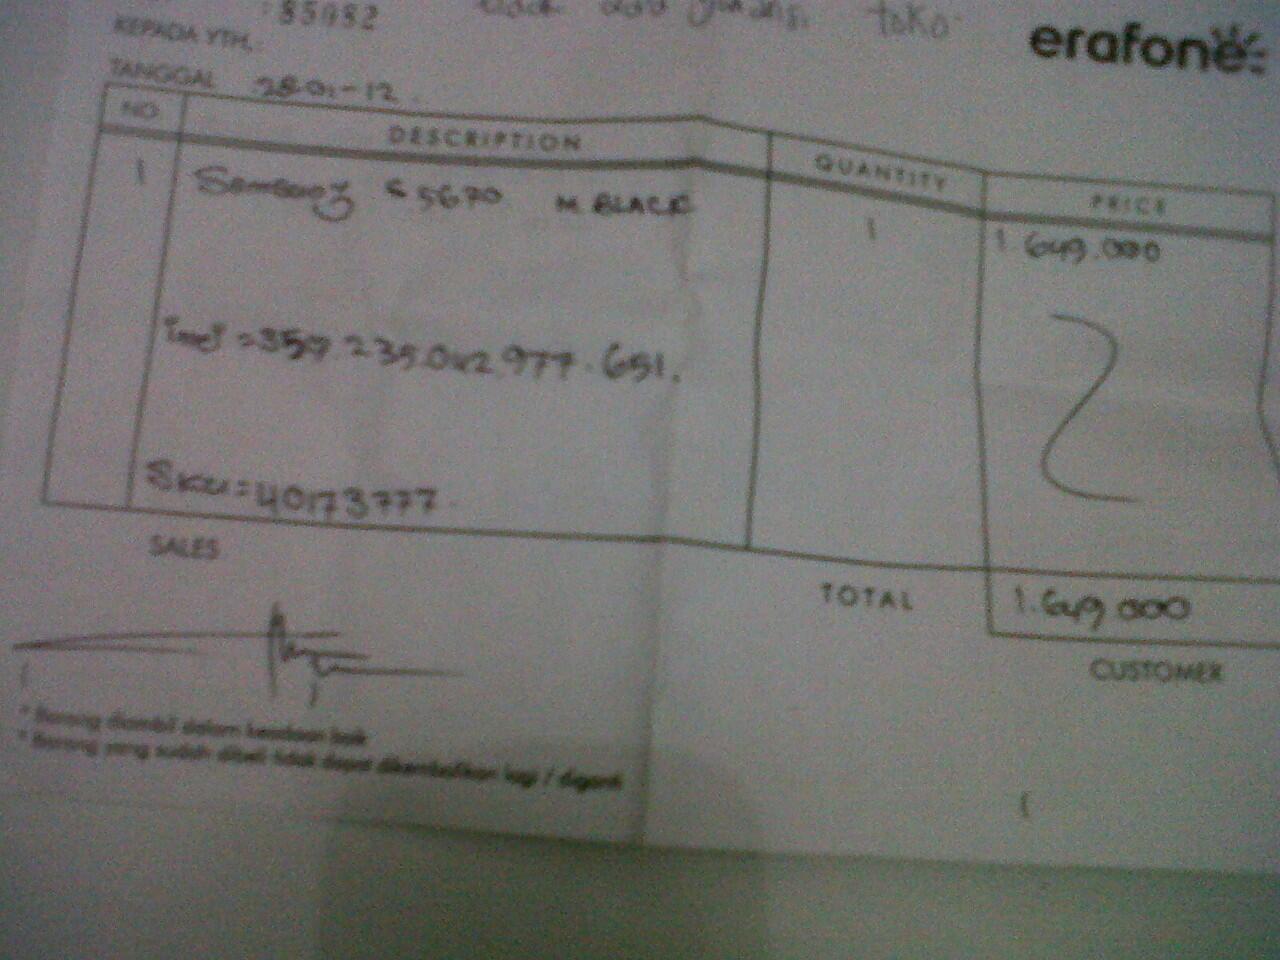 JUAL CEPAT & BUTUH, SAMSUNG GALAXY FIT GT5670